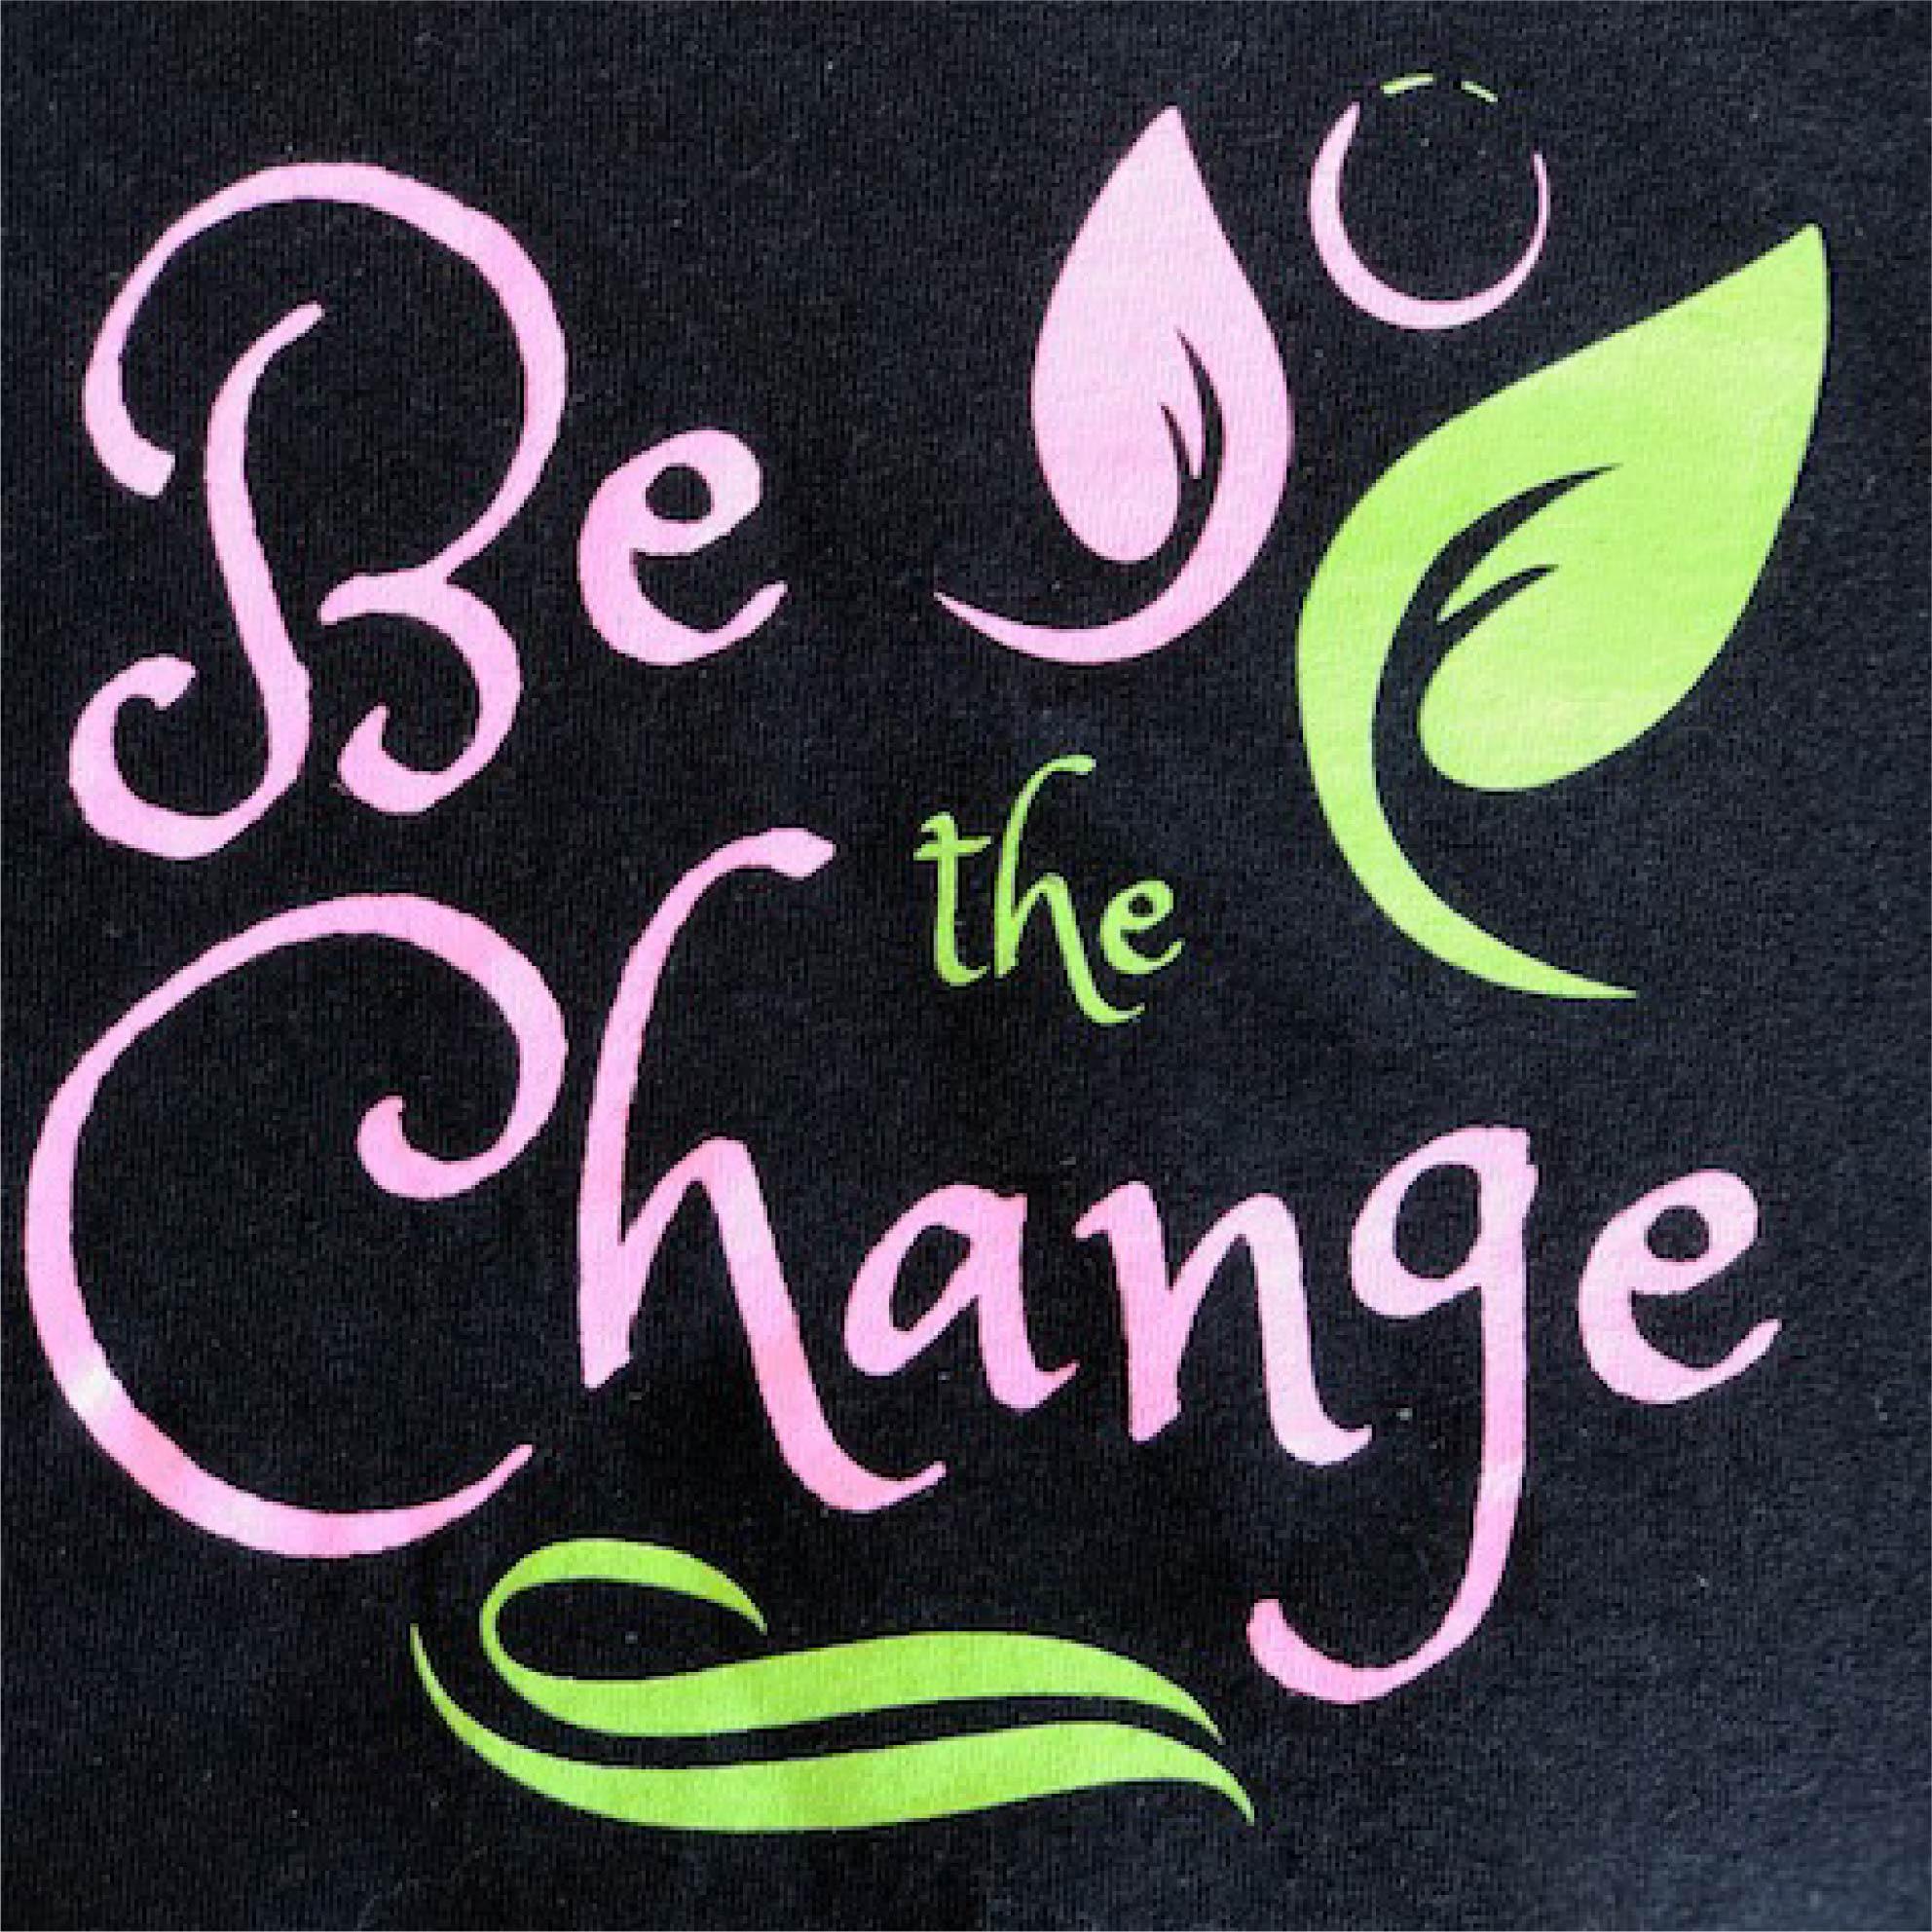 Be the Change Logo on Black Shirt